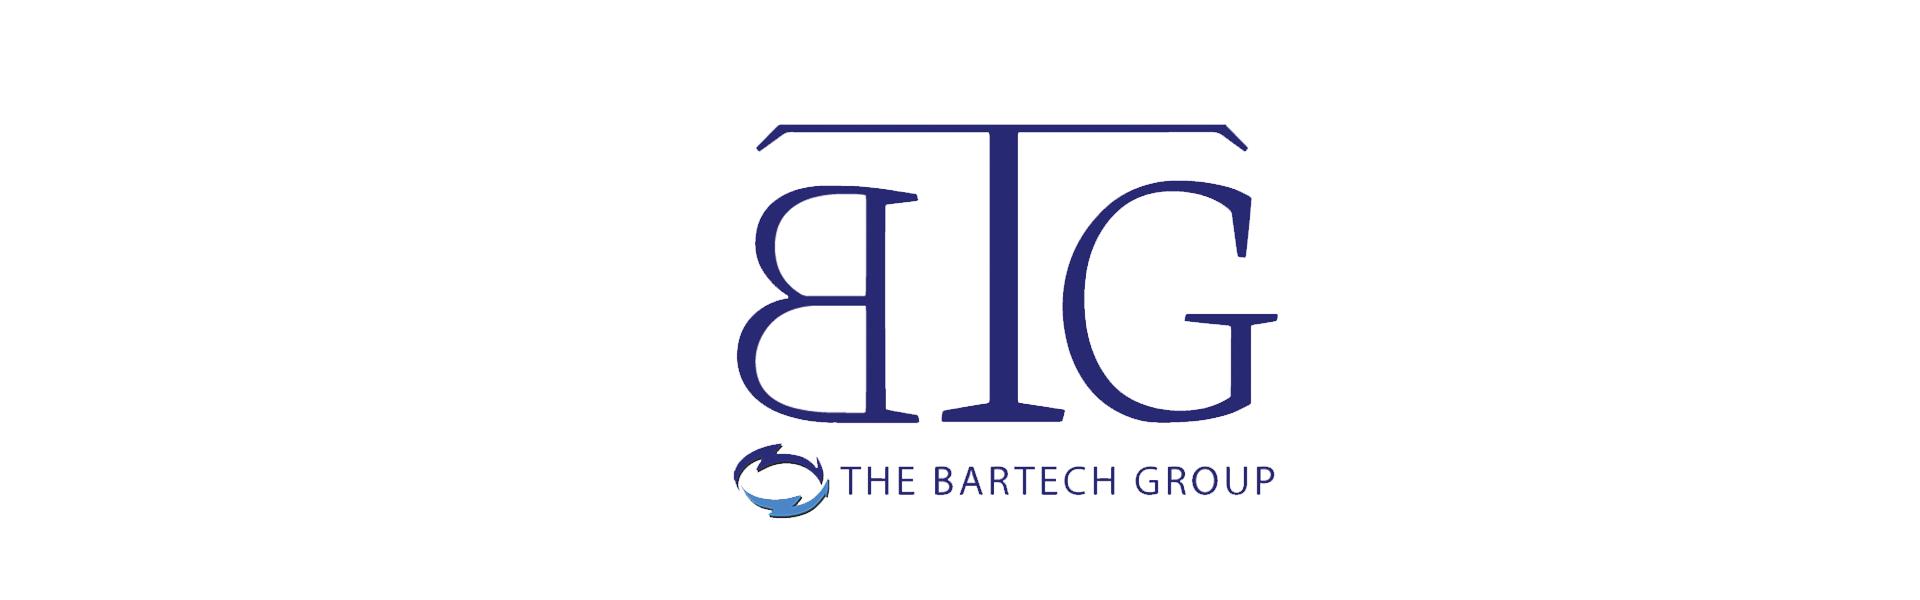 New BTG Logo